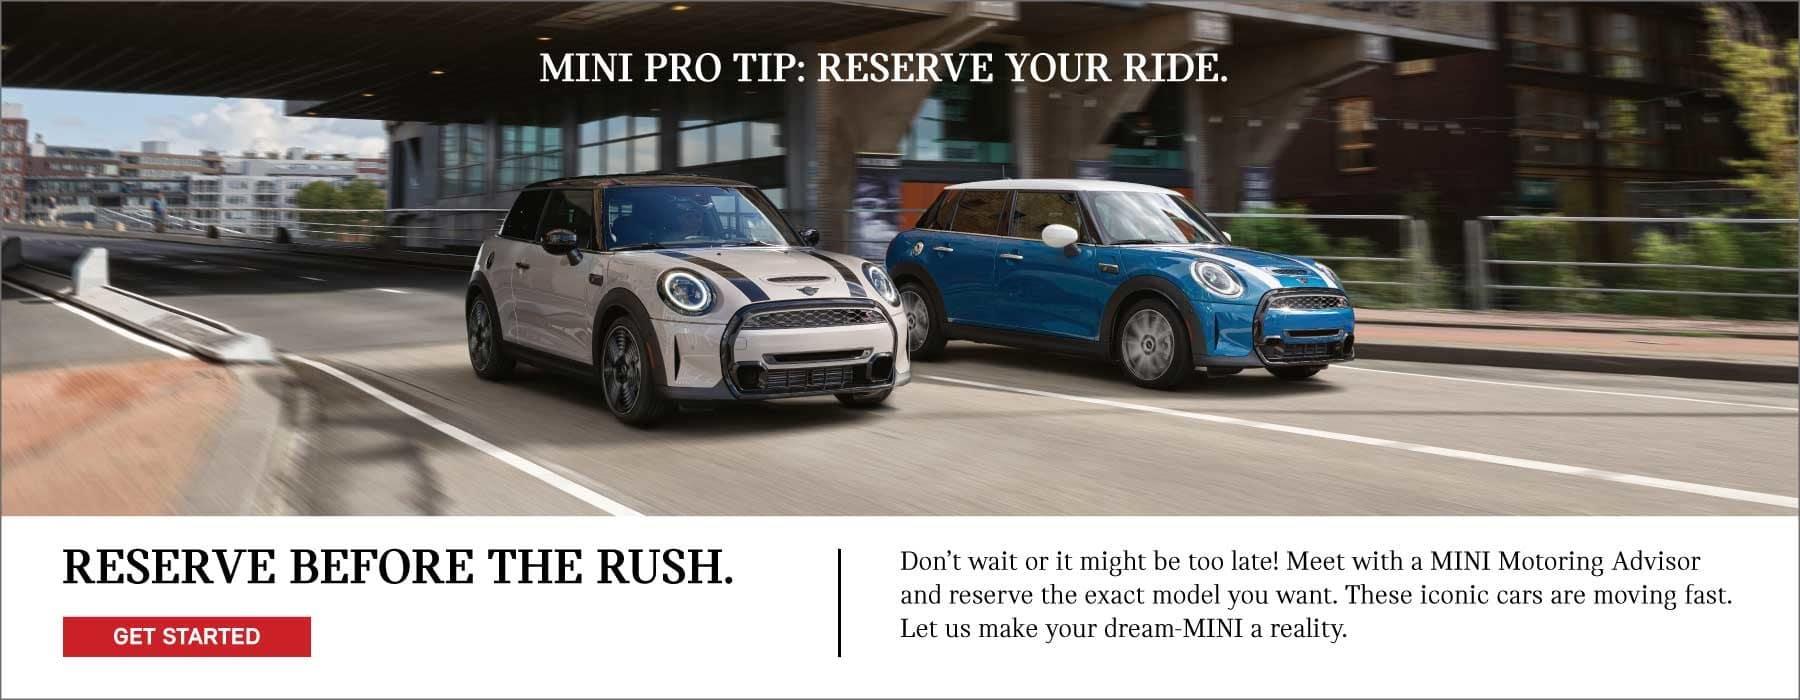 MINI Pro Tip: Reserve Your MINI and Beat the Rush!